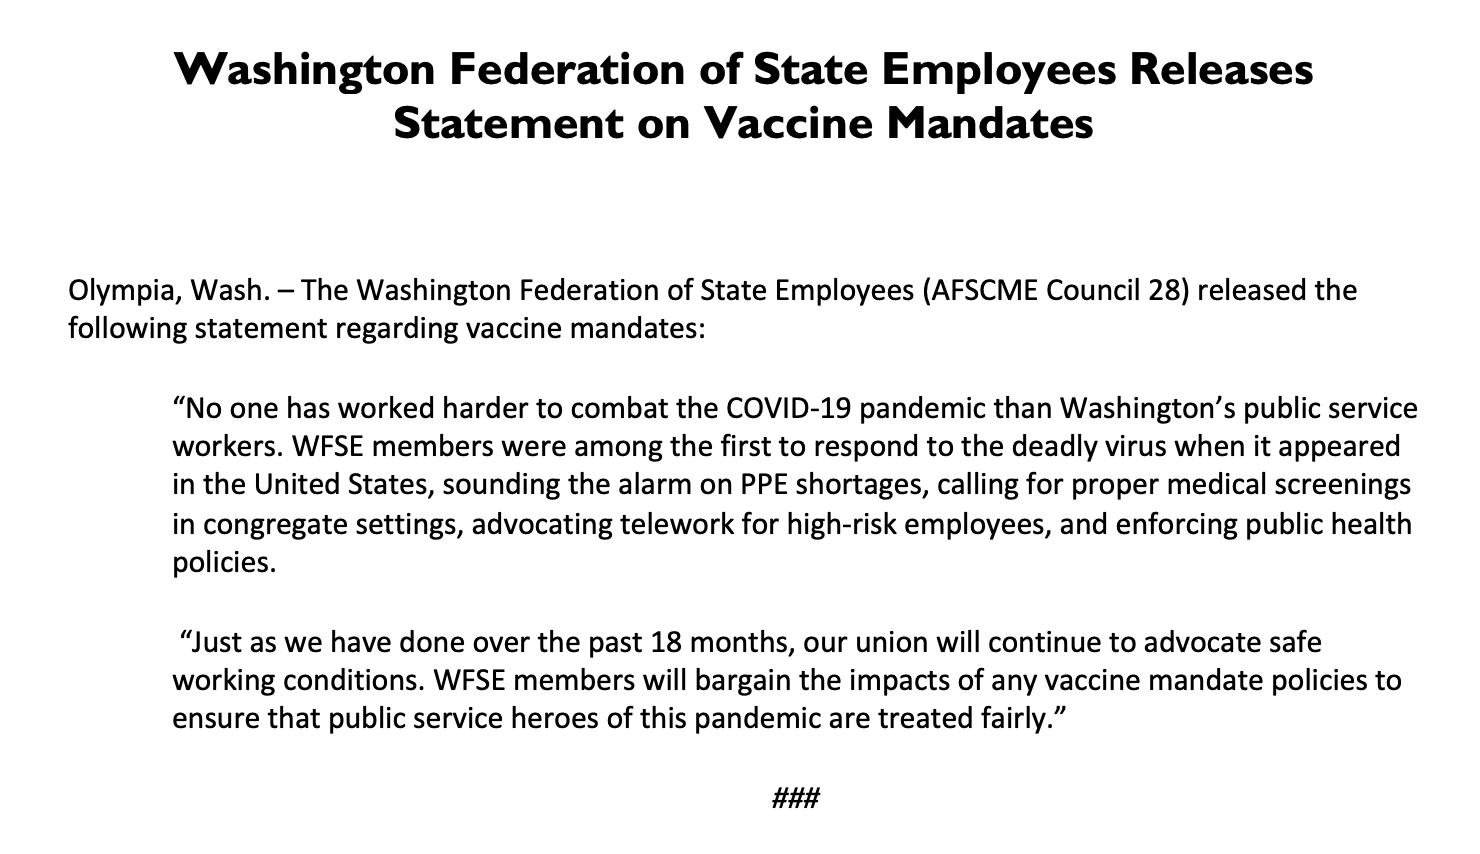 Graphic: Statement on Vaccine Mandate